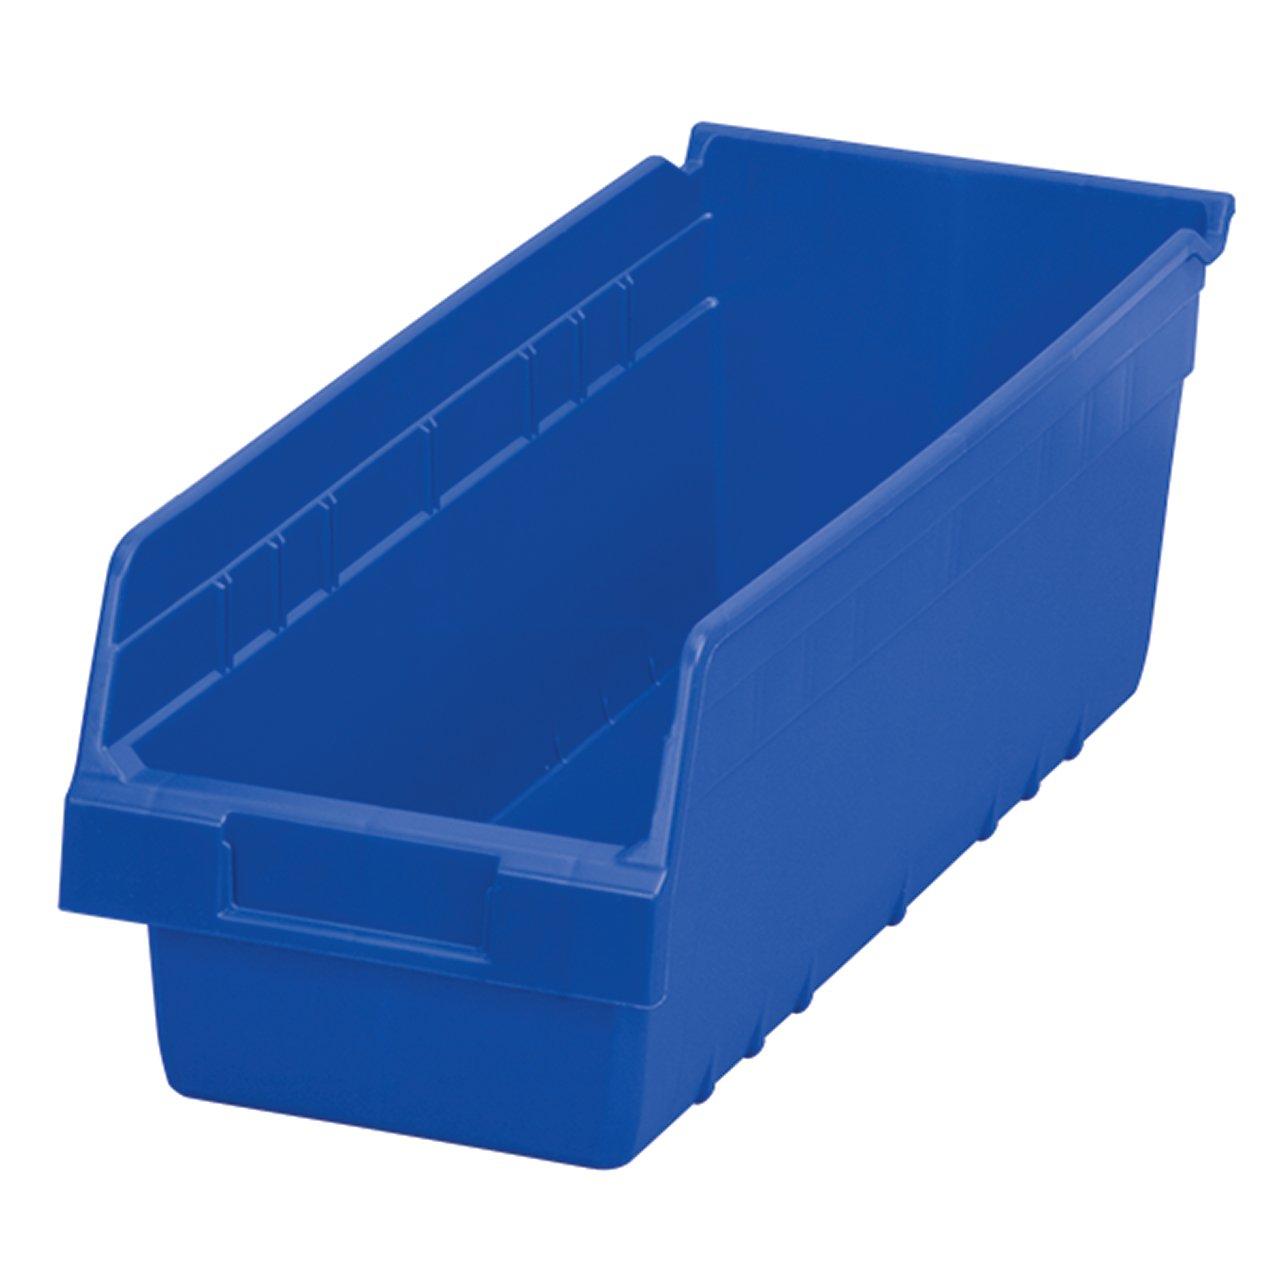 Akro-Mils 30098 ShelfMax Plastic Nesting Shelf Bin Box, 18-Inch Length x 6.75 Inch Width x 6-Inch Height, Case of 10, Blue by Akro-Mils